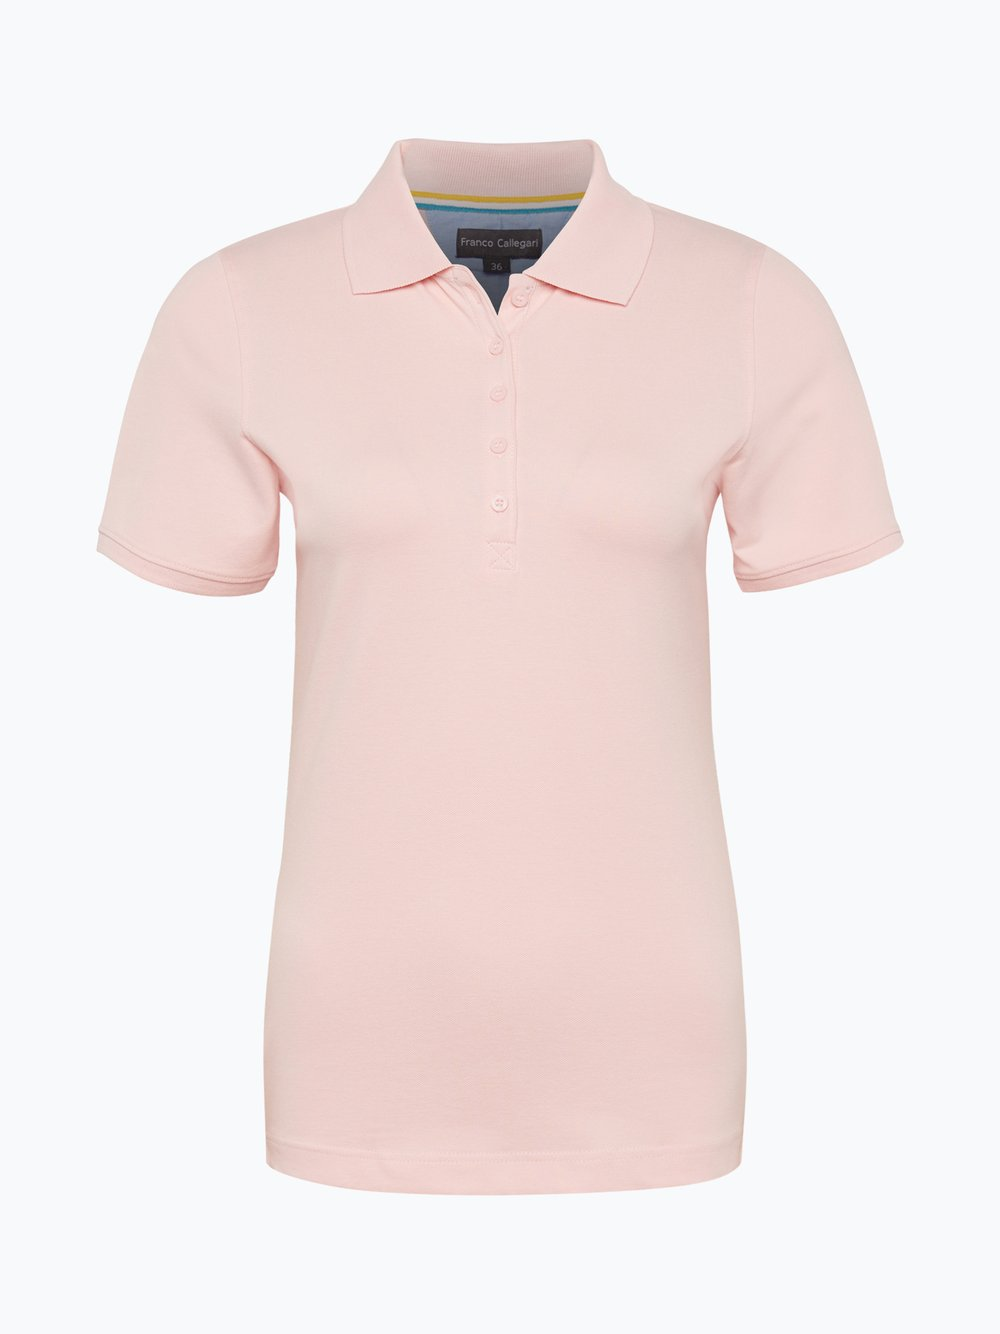 Franco Callegari - Damska koszulka polo, różowy